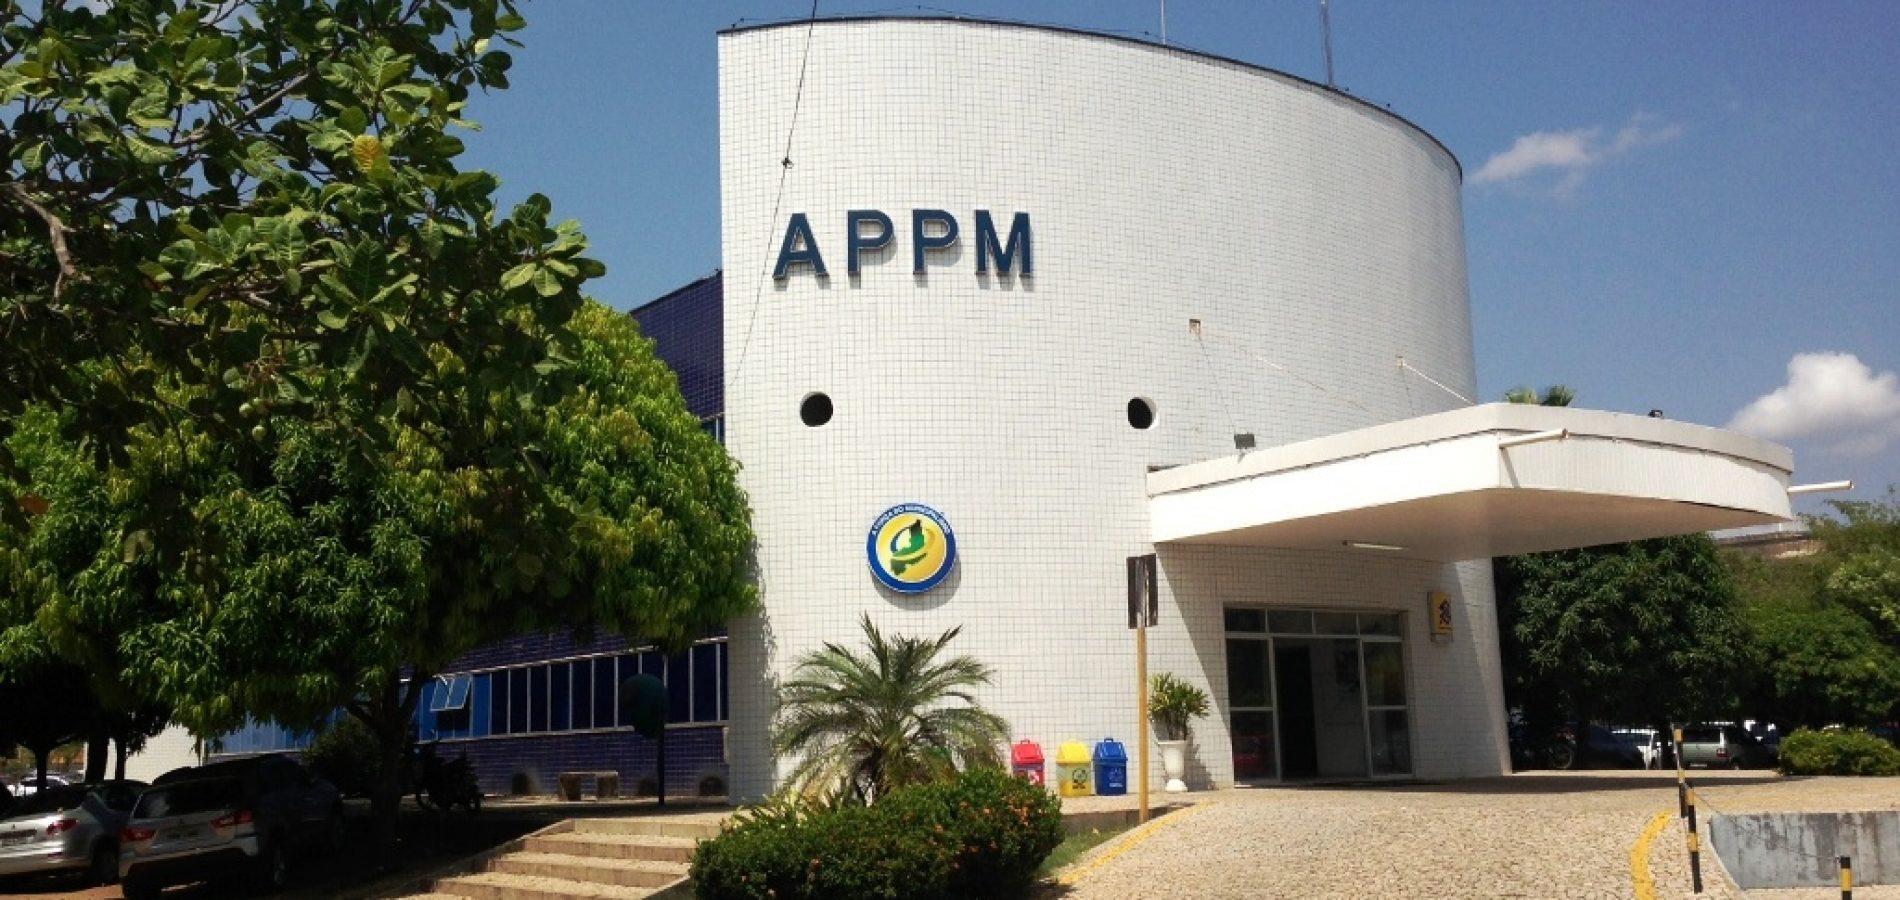 APPM disponibiliza portal da transparência para municípios no Piauí